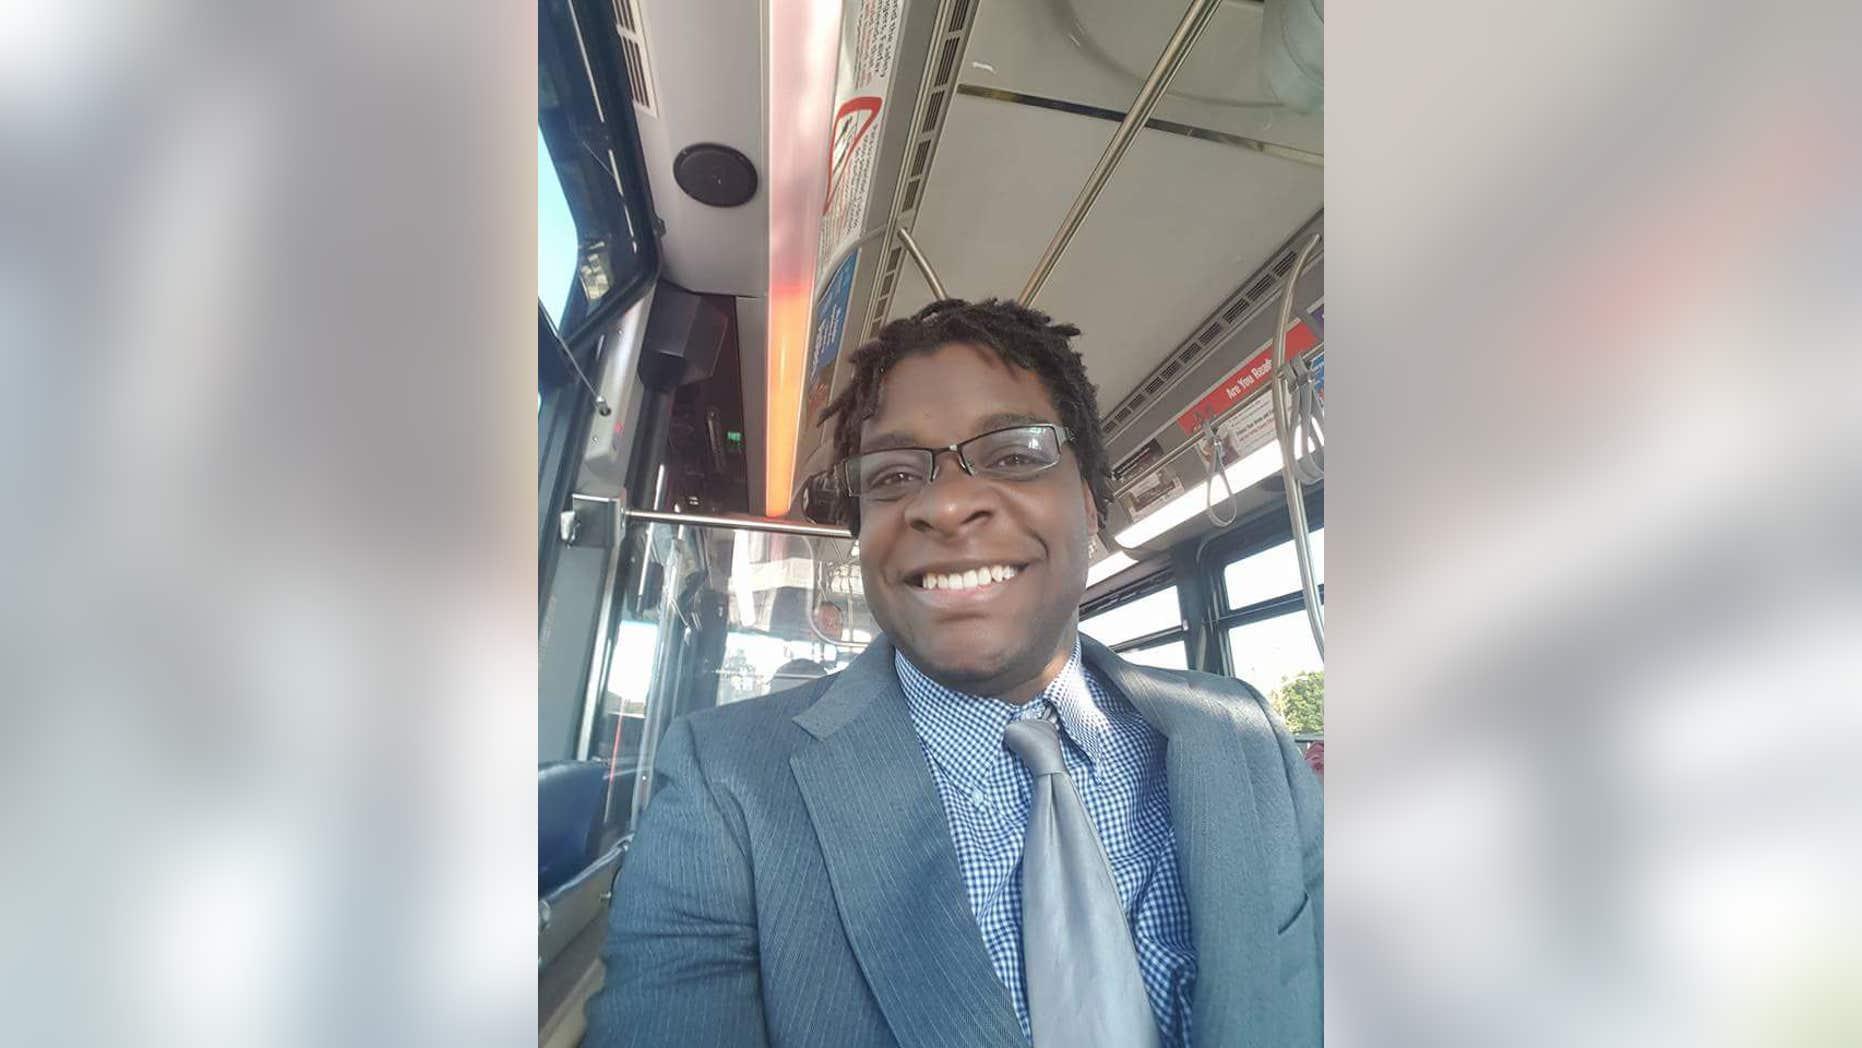 Washington resident D'Arcee Neal frequently uses public transportation.